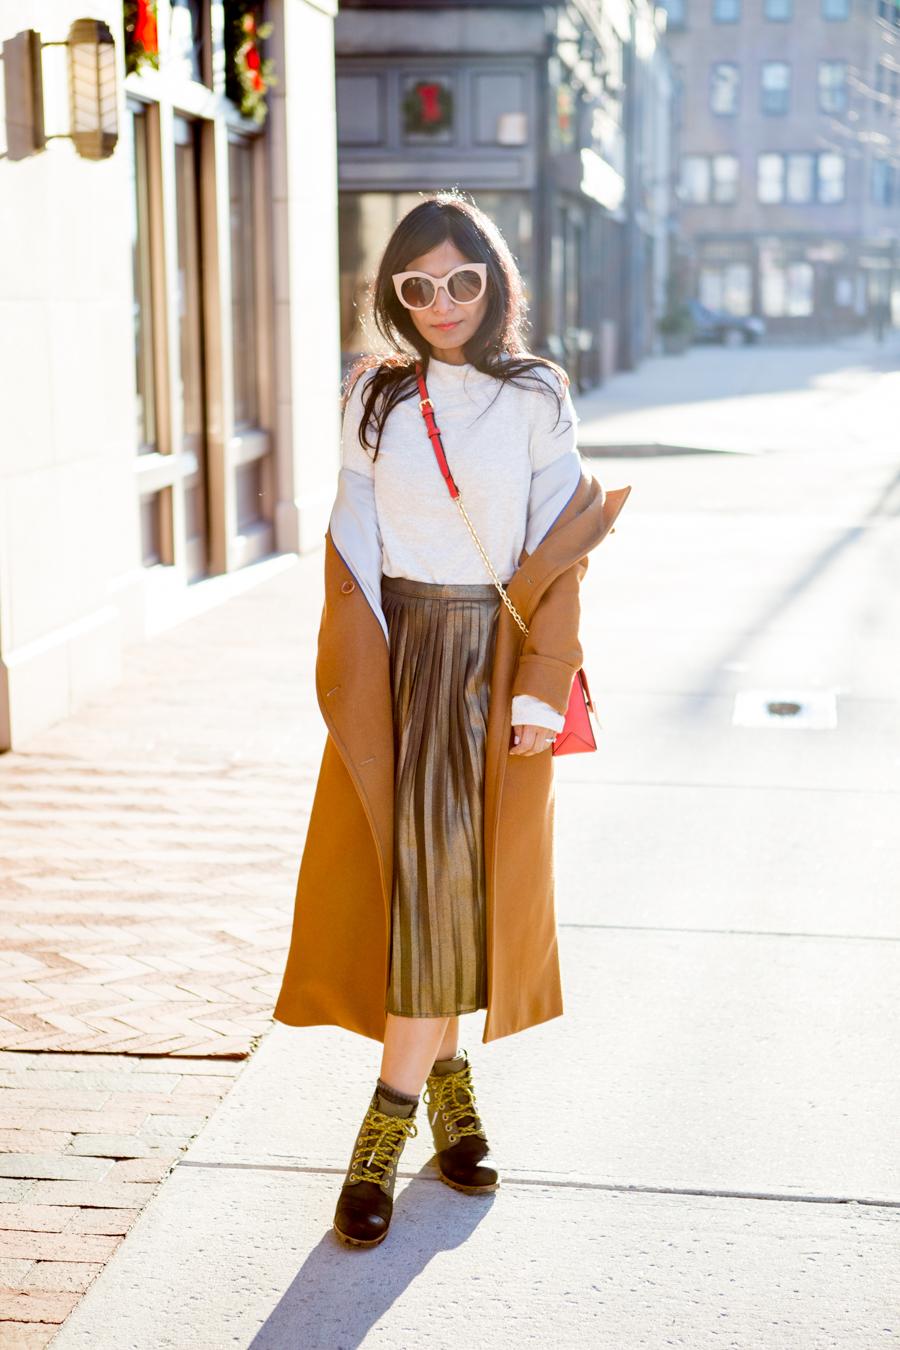 camel, winter wardrobe, winter fashion, petite style, sorel, jcrew, trouve, feminine style, cute winter boots, petite style, warm colors, petite blogger